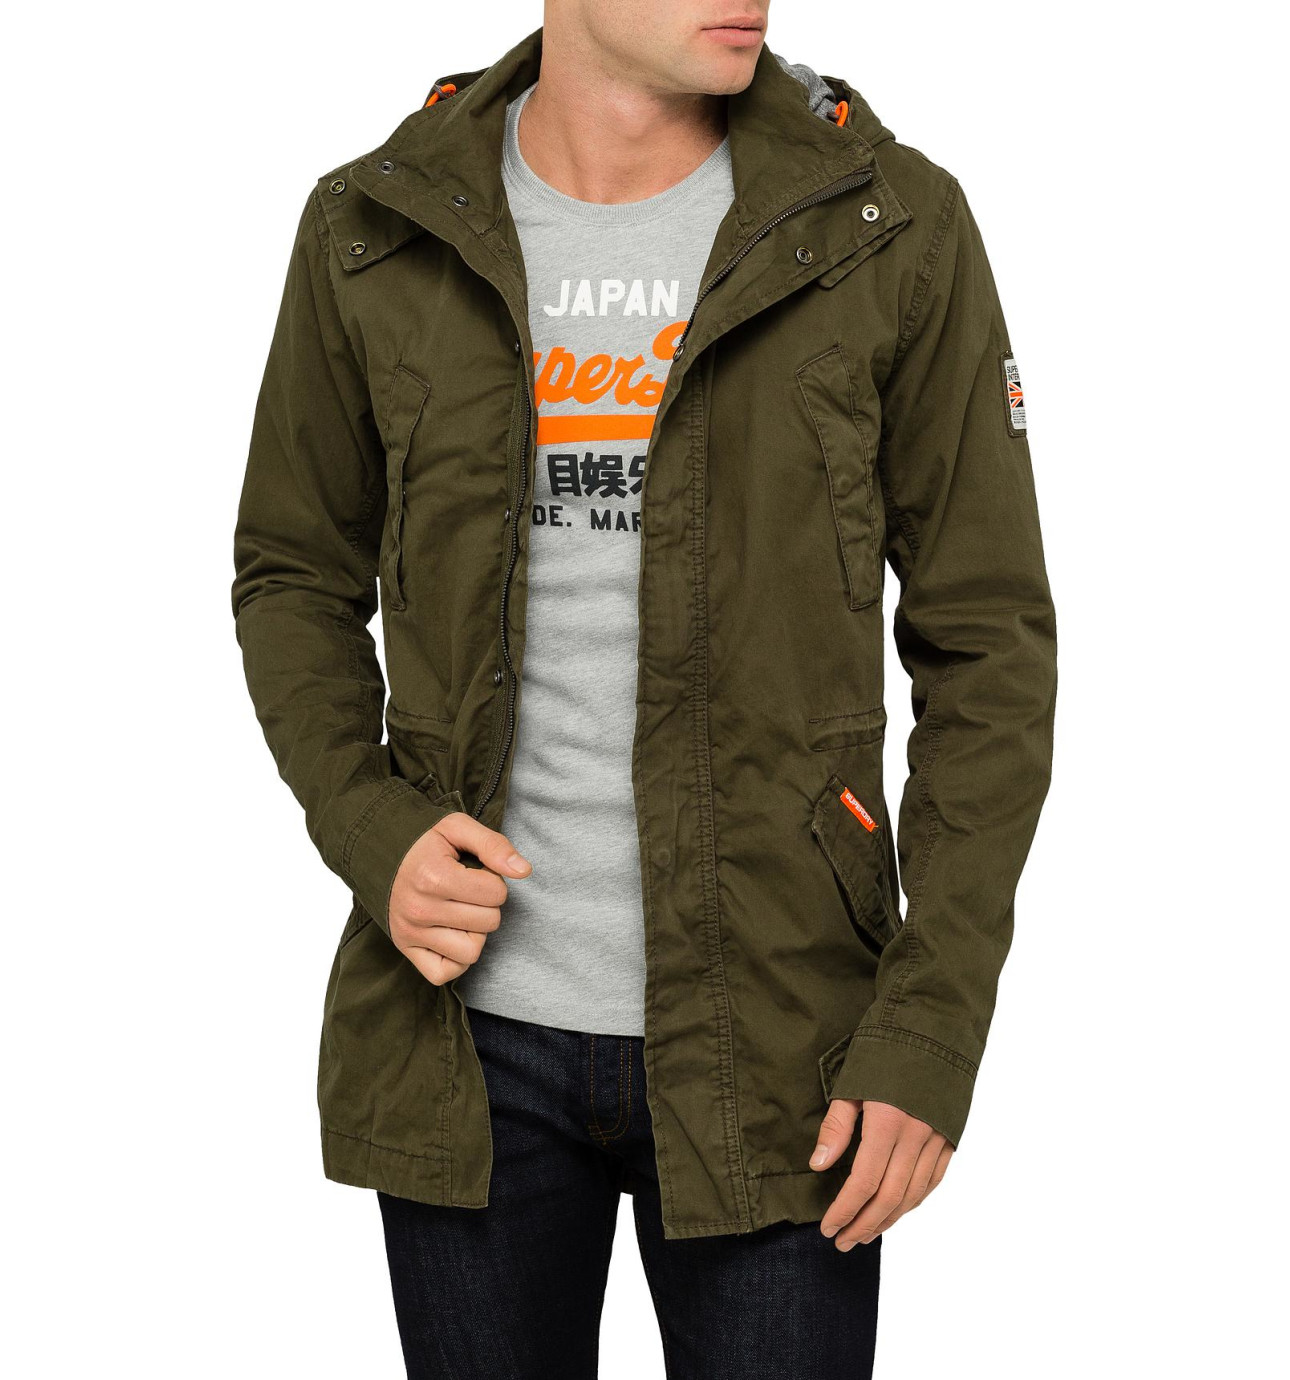 Mens jacket david jones - Rookie Duty Parka